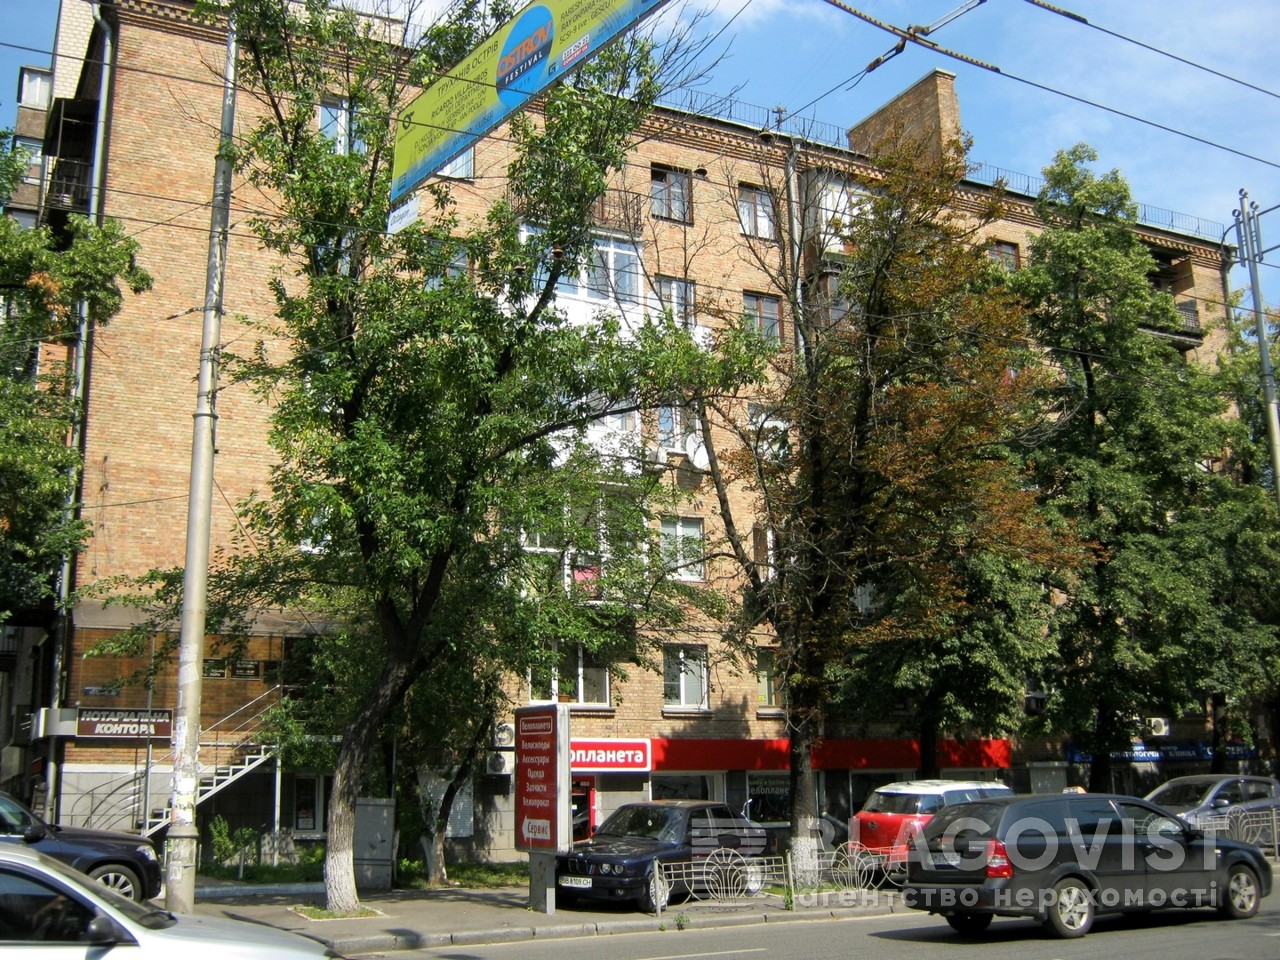 Стоматология, Z-234106, Толстого Льва, Киев - Фото 2